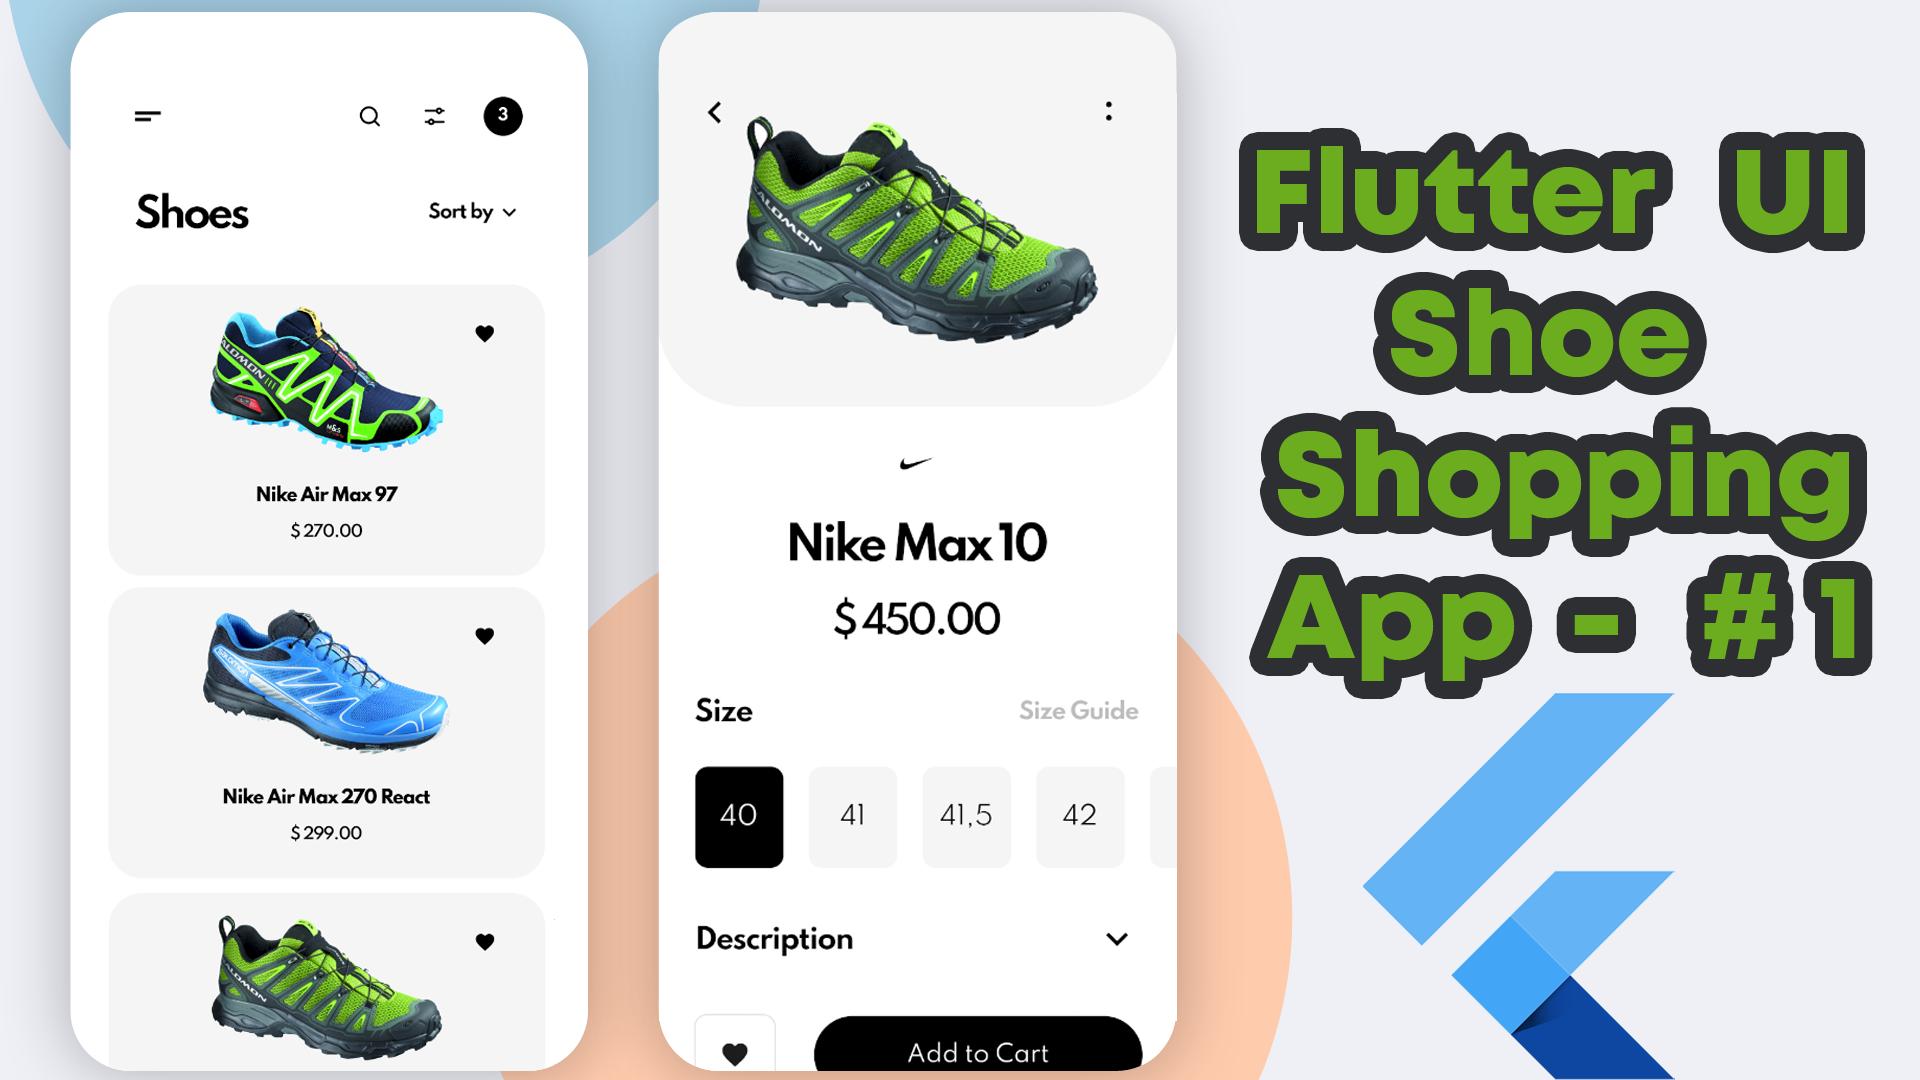 Shoe Shopping Mobile App | Flutter UI | UI Design To Flutter Dart Code  #1